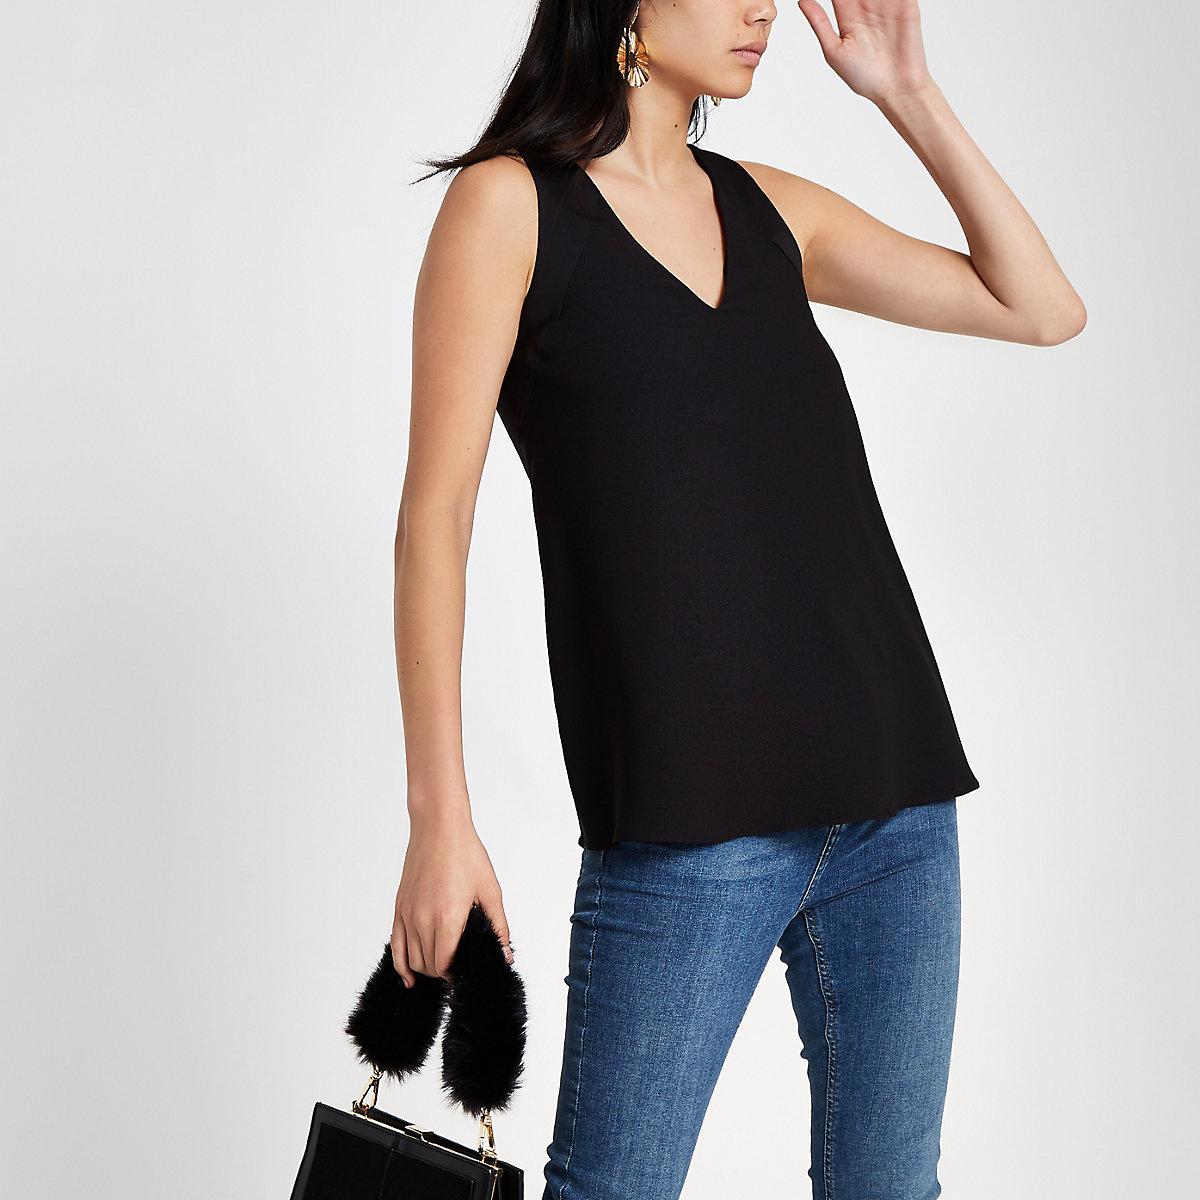 Black V neck contrast tank top